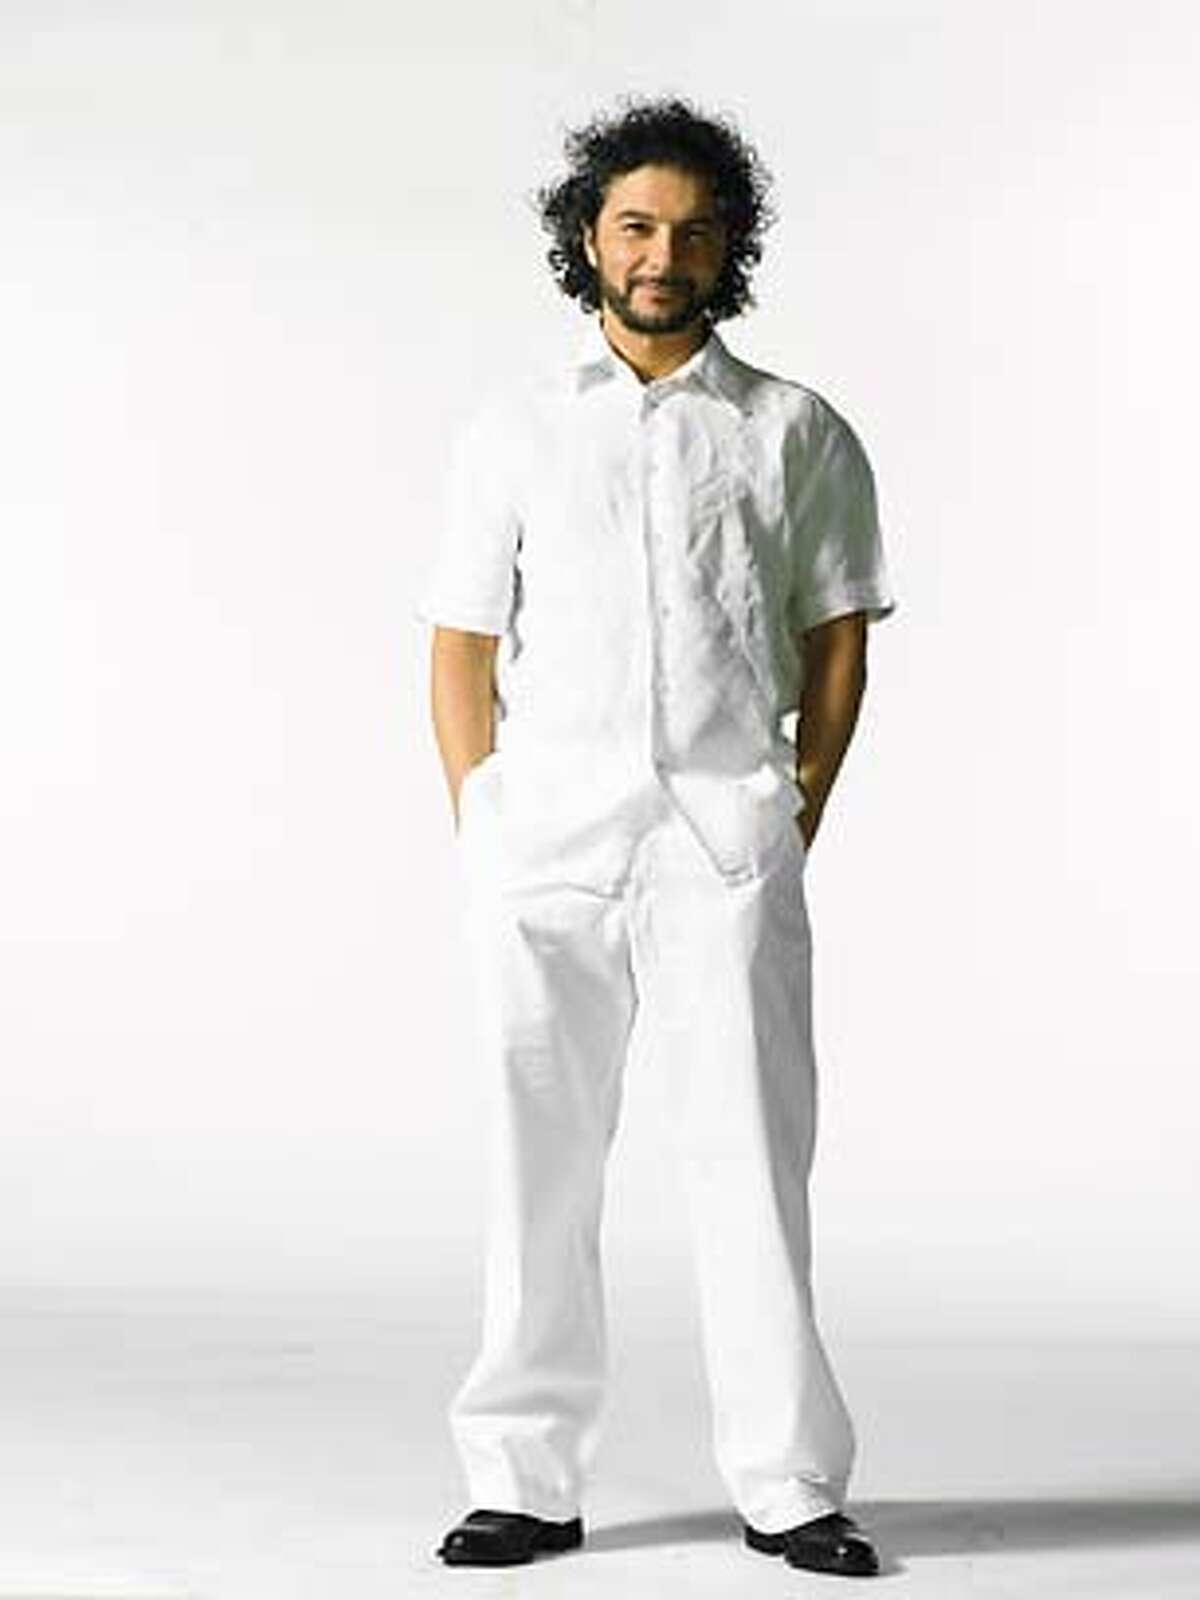 Cirque09_02.JPG Daniele Finzi Pasca (man in white) handout